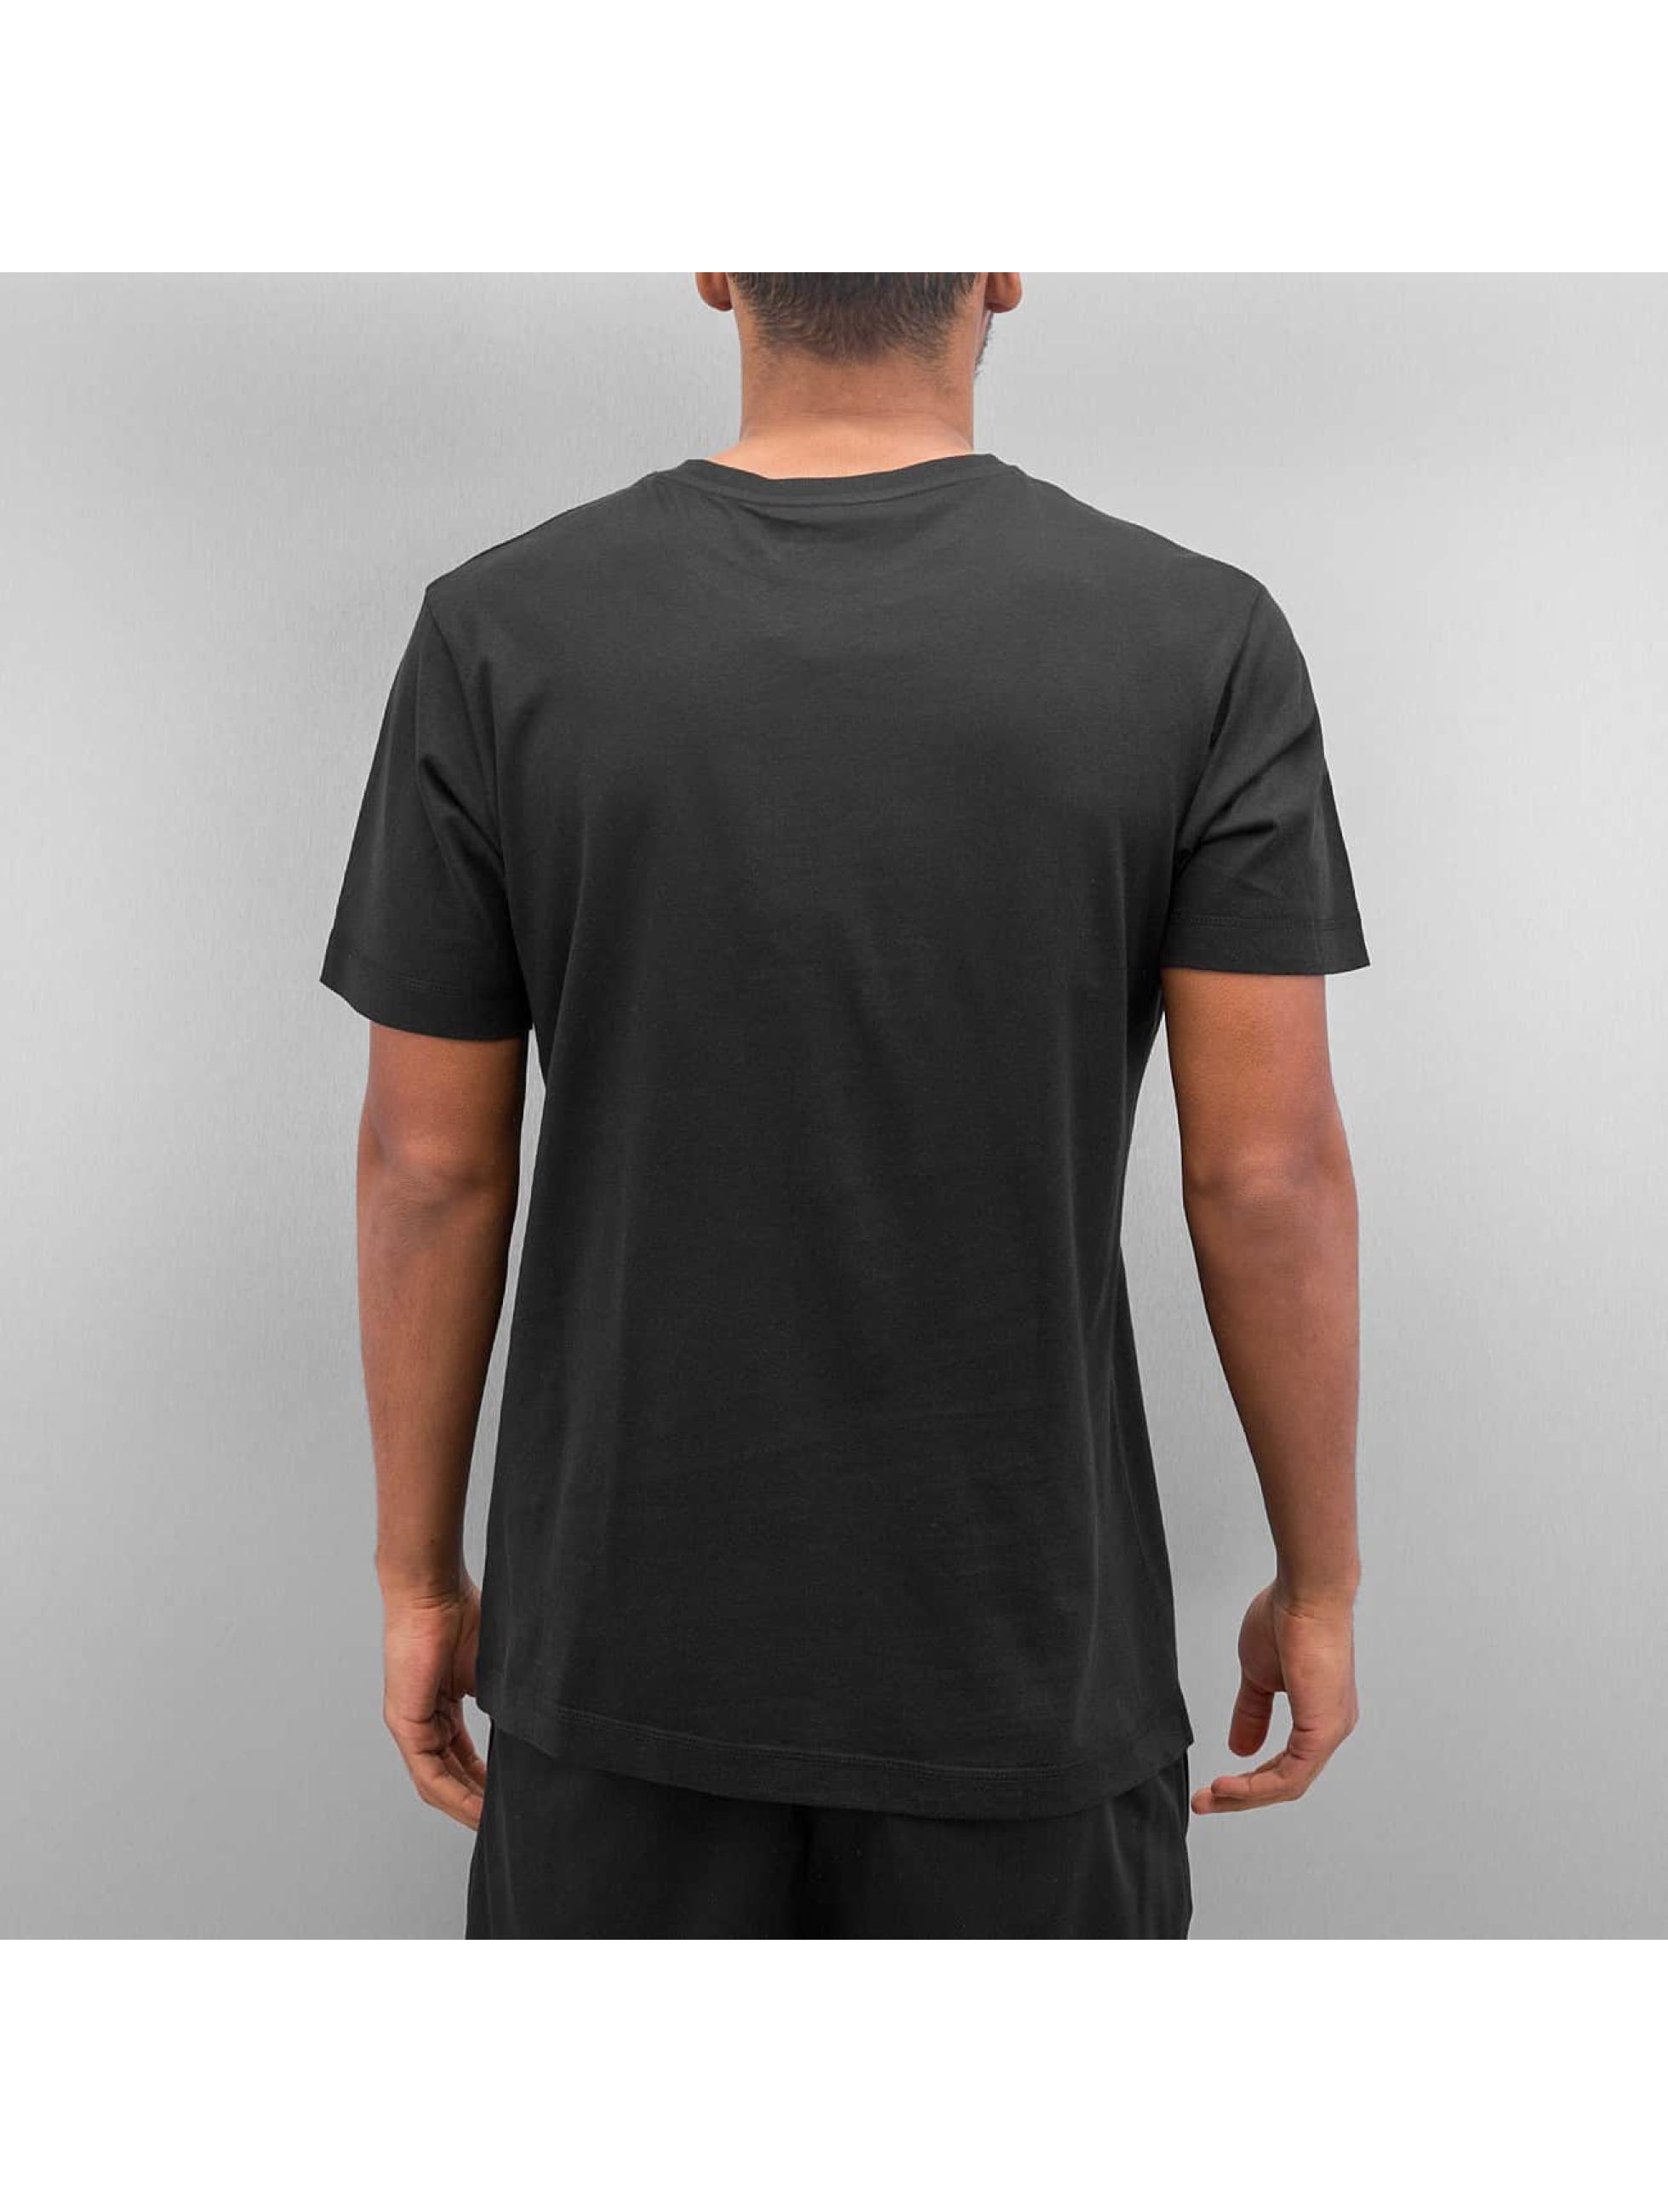 Ichiban t-shirt Floral Gun zwart